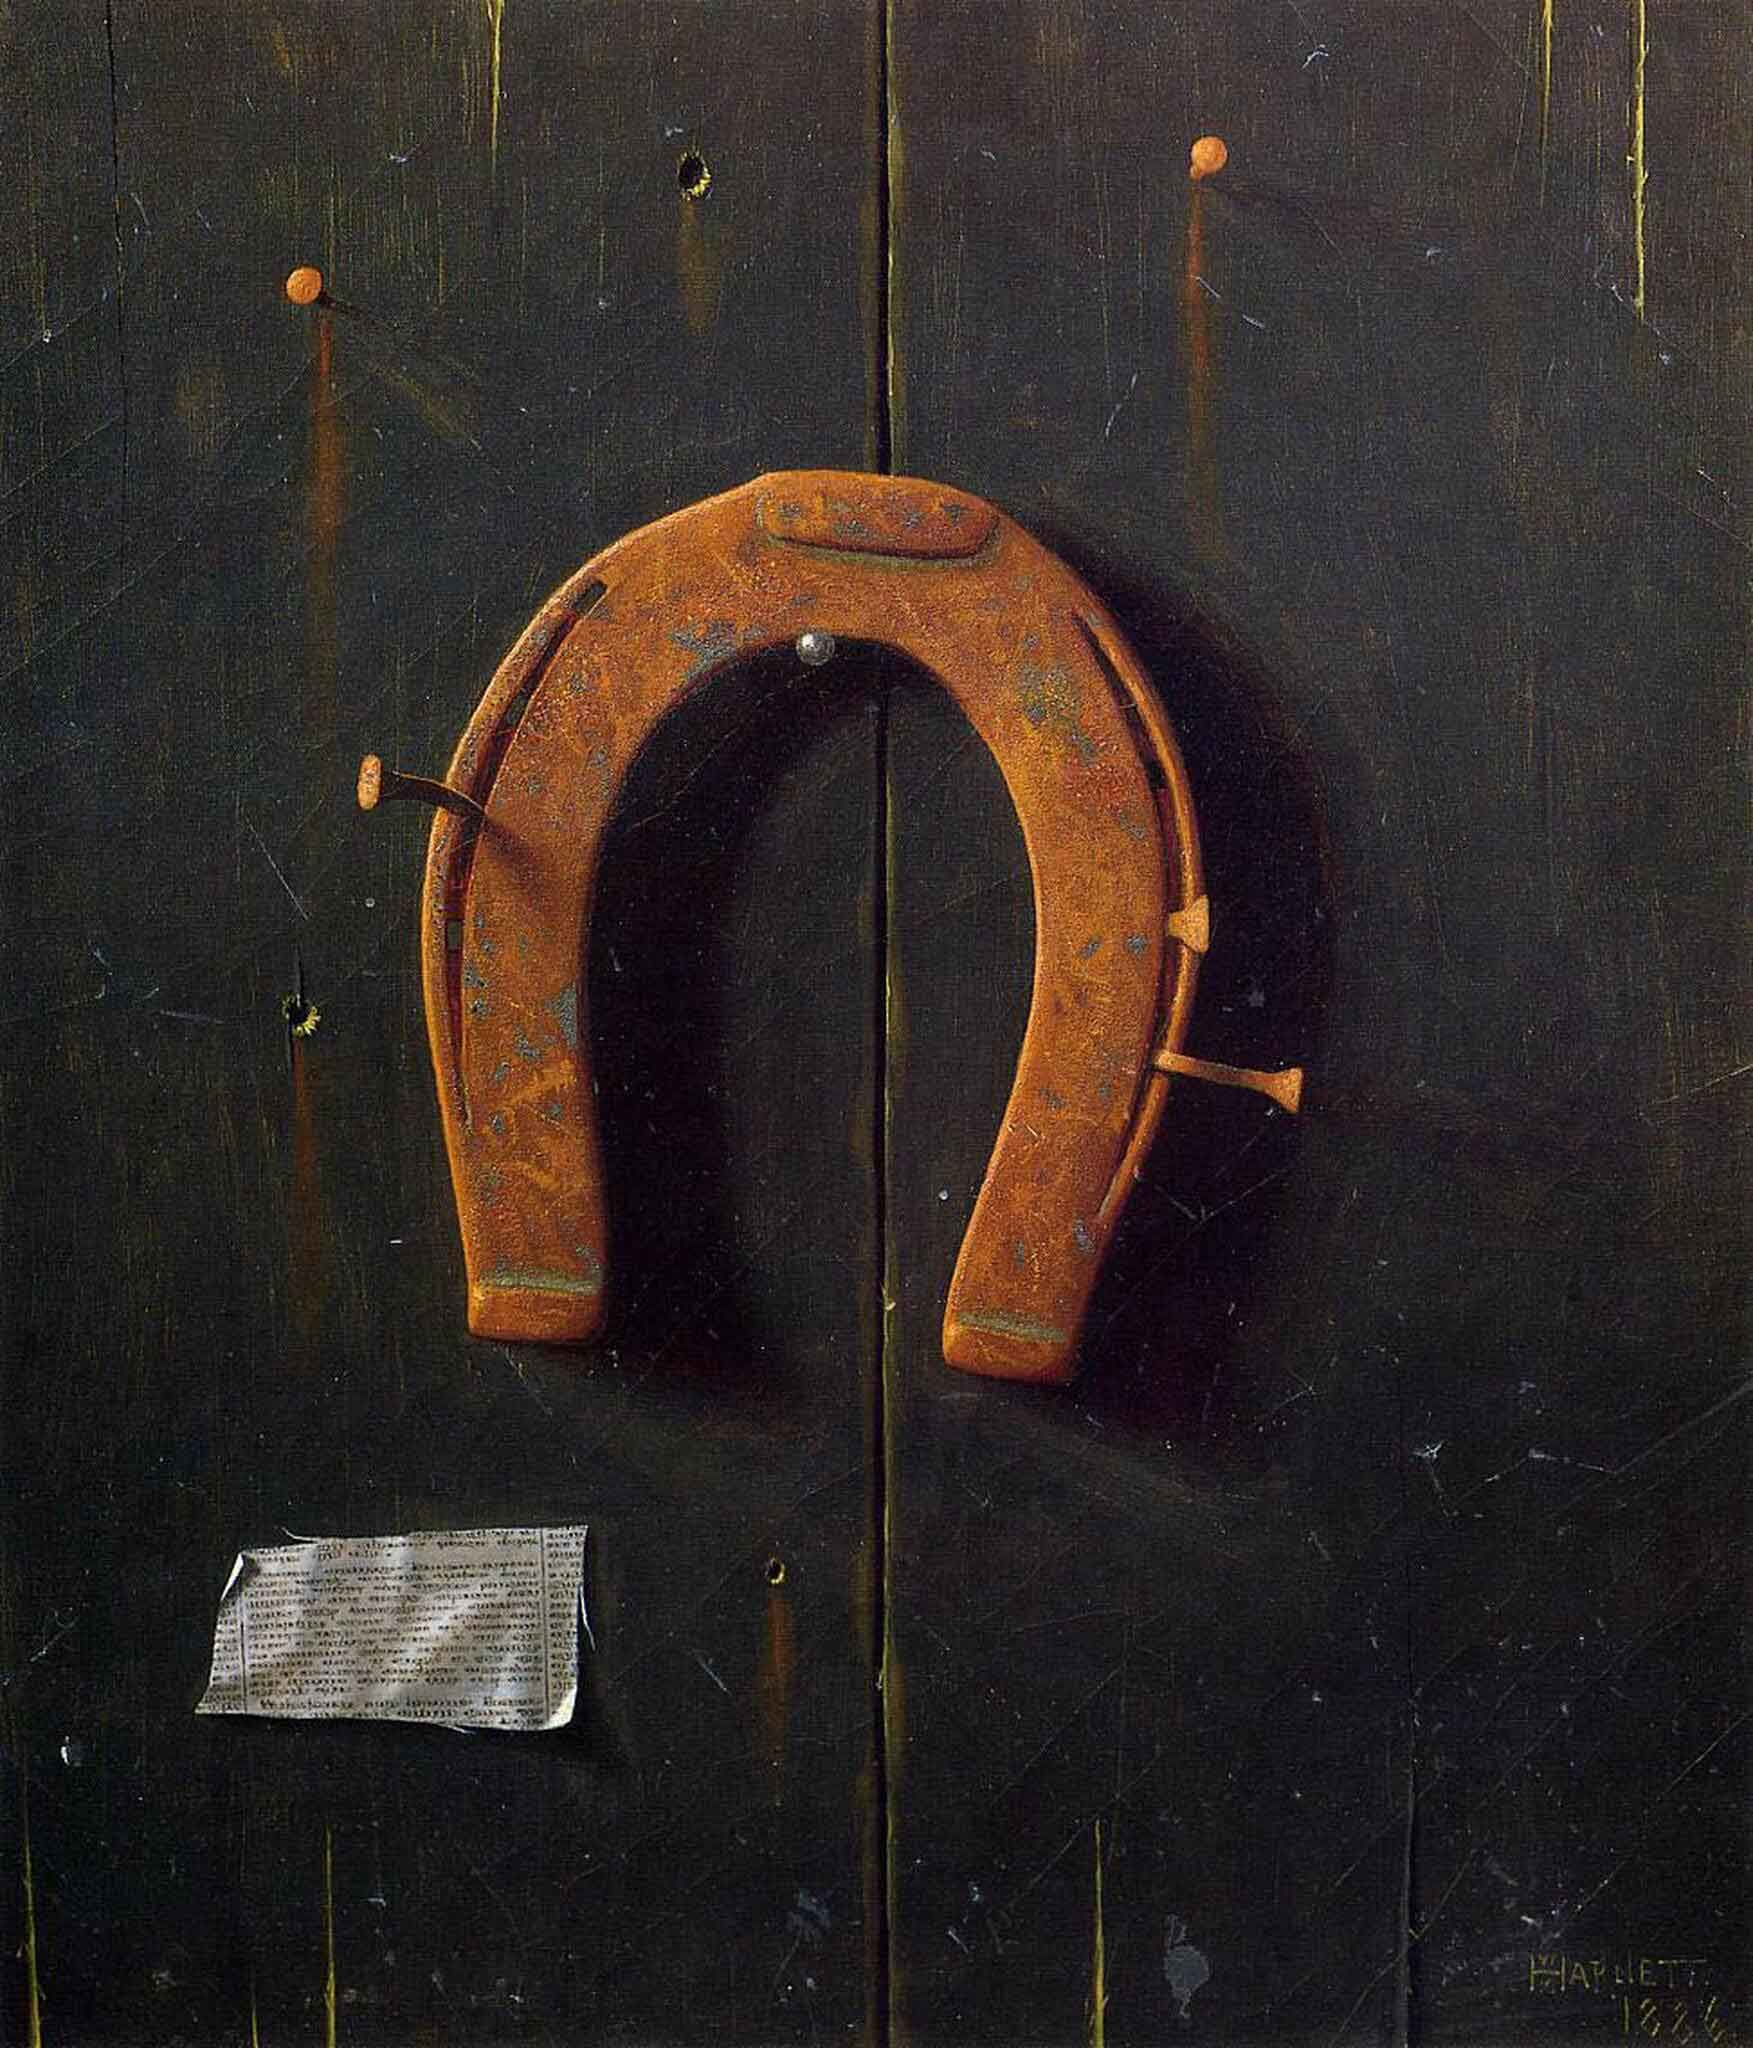 La herradura dorada de William Michael Harnett